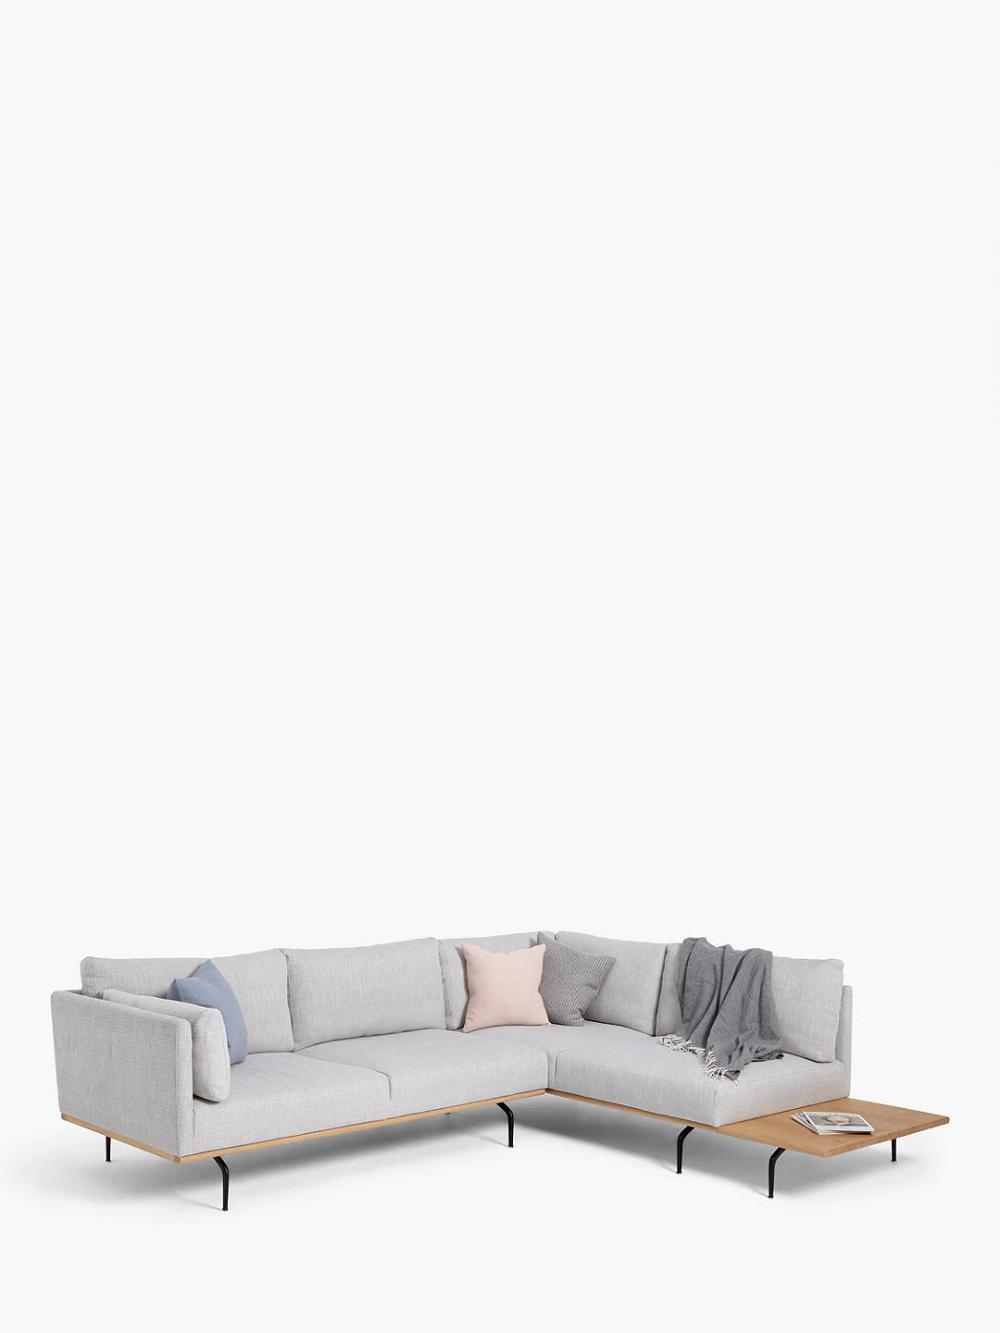 John Lewis Partners Platform Rhf Corner End Sofa With Table Metal Leg Hope Grey In 2020 Sofa John Lewis Furniture